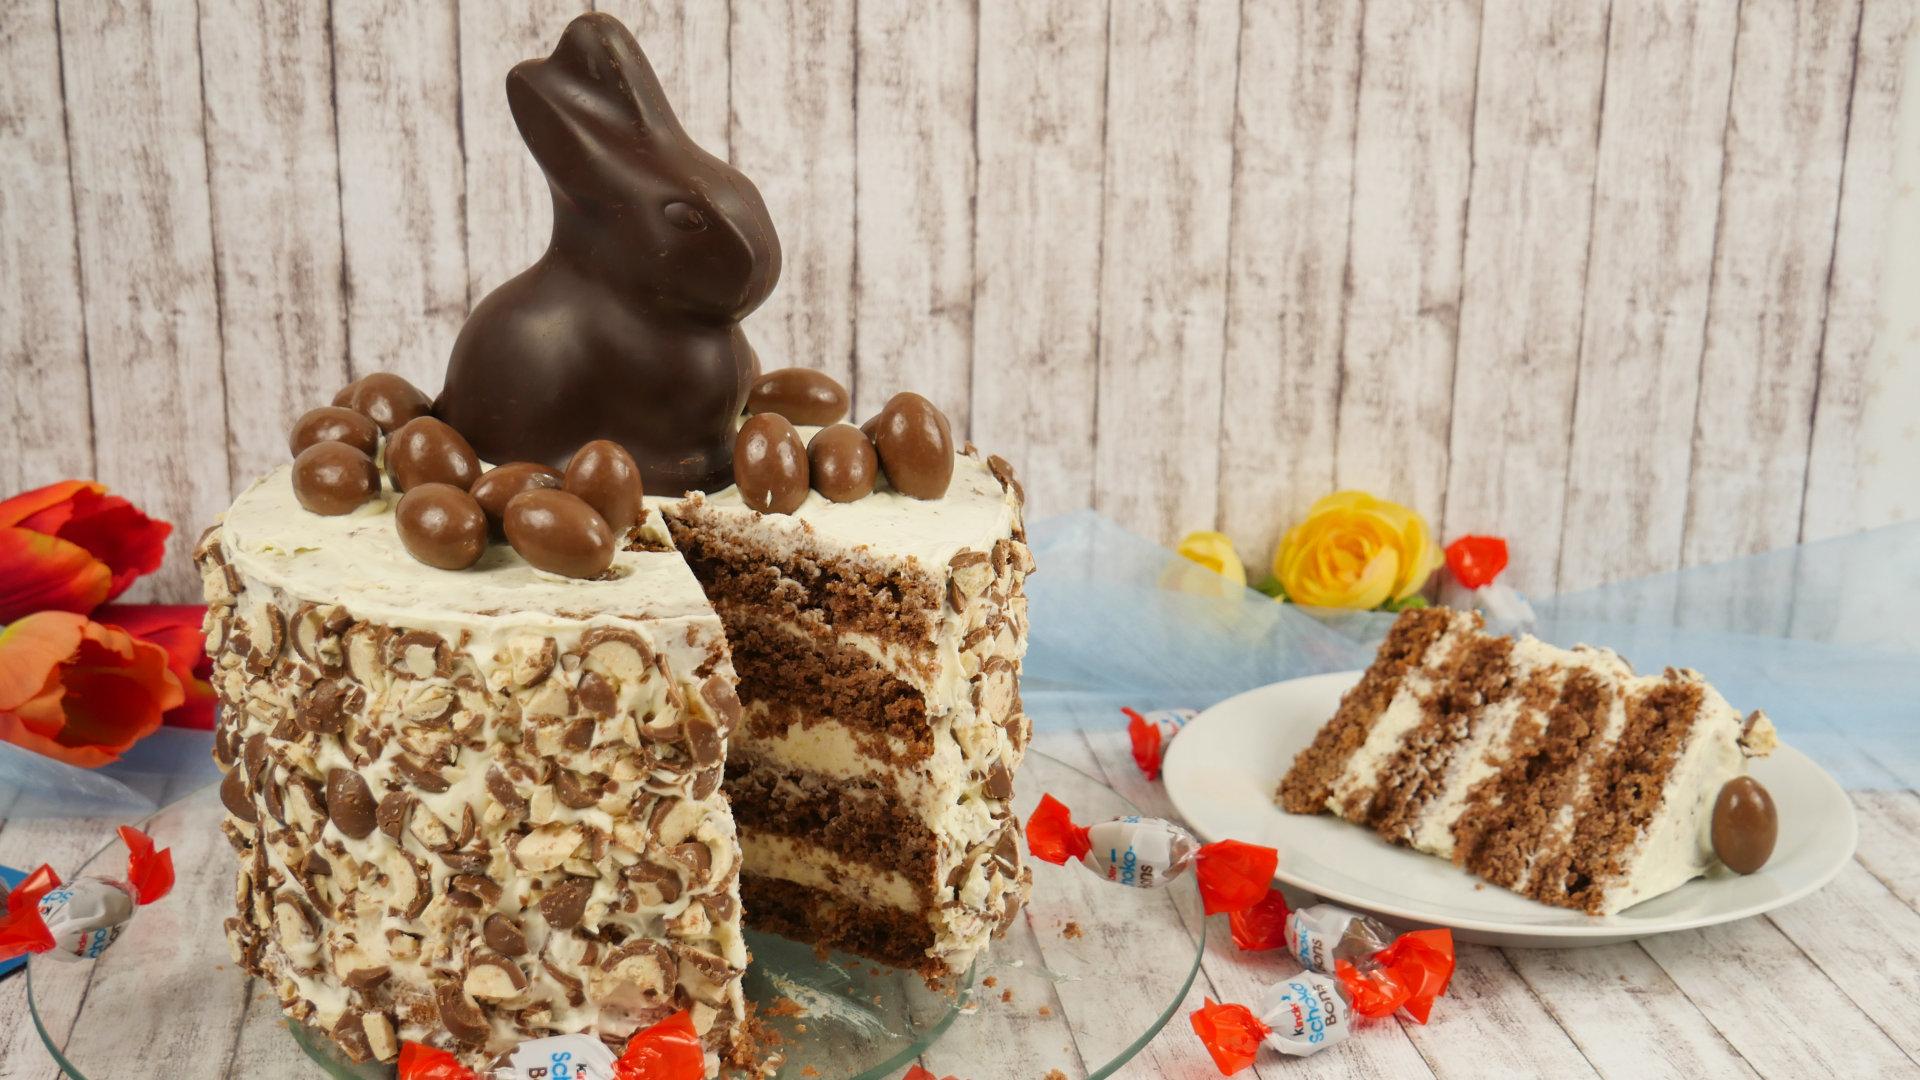 Rezept Kinder Schoko Bon Torte Rezept Ostertorte Schokoladentorte